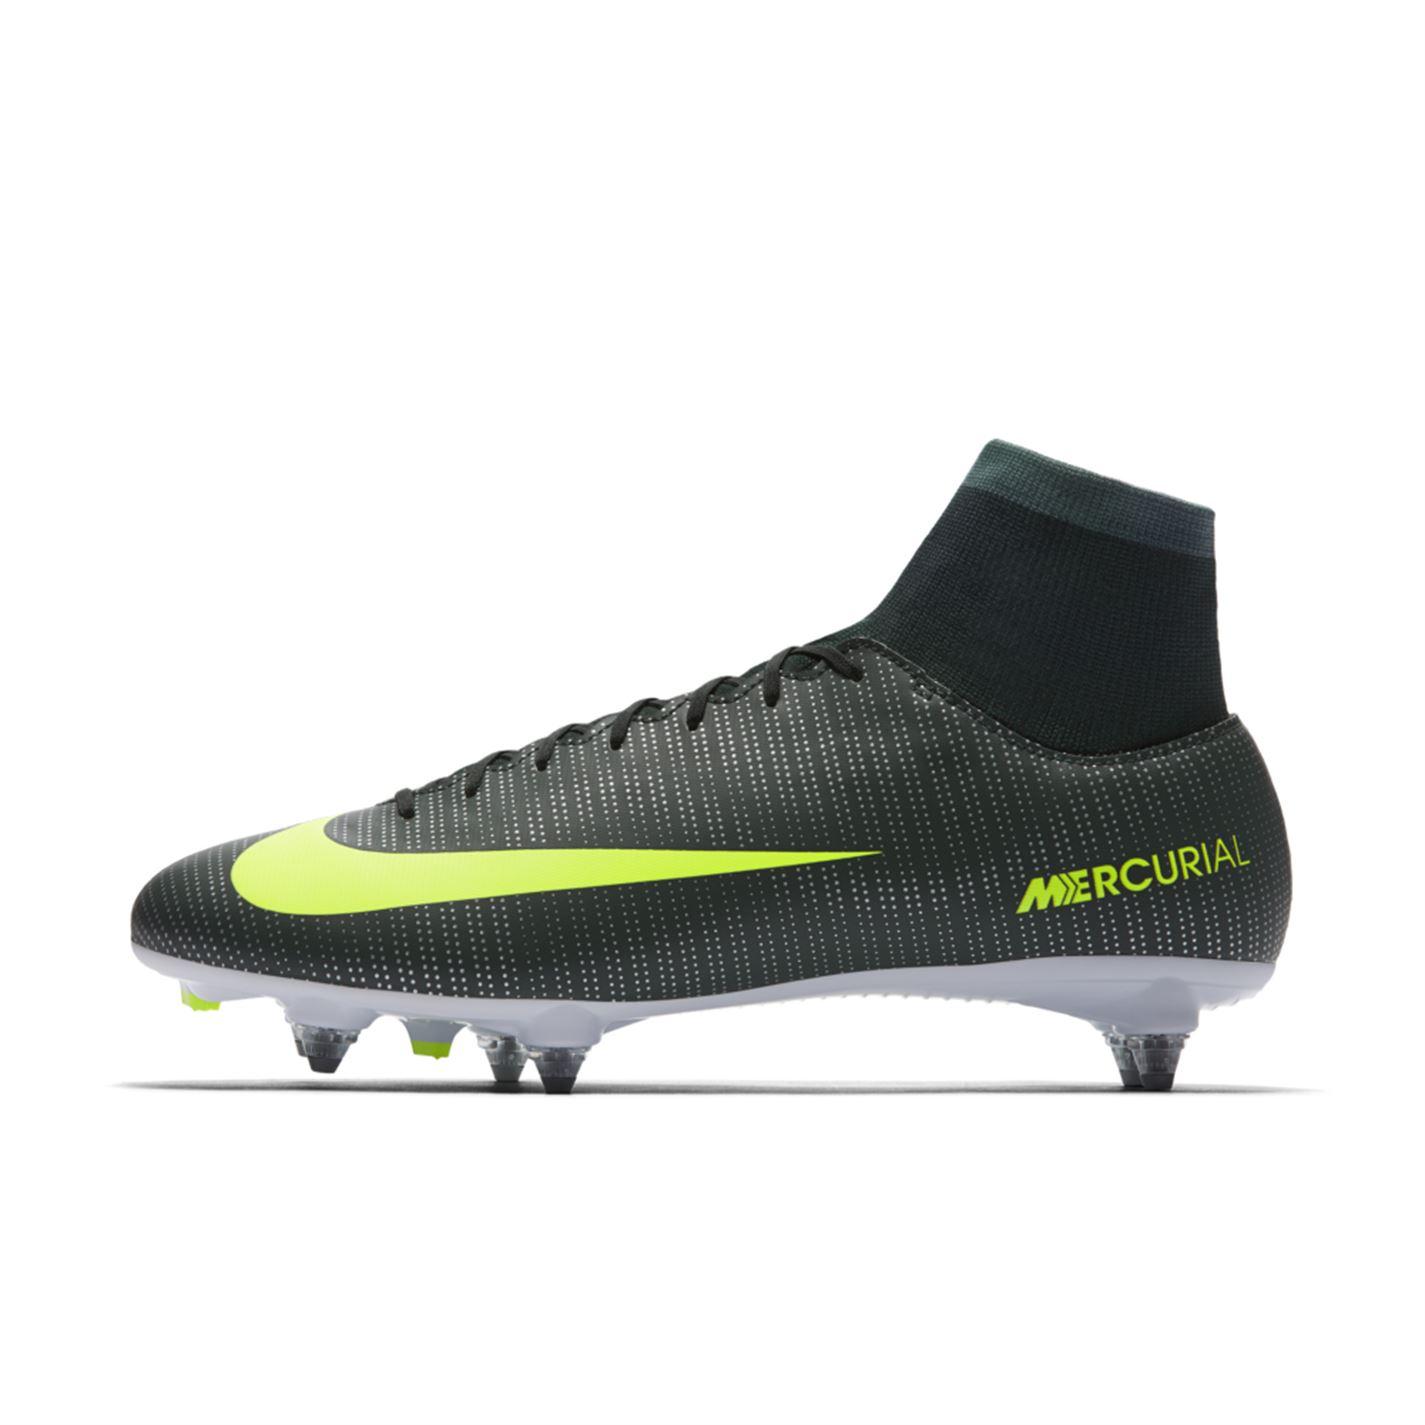 cel mai bine vândut potrivire clasică AliExpress Ghete-de-fotbal- -Nike-Mercurial-Victory-CR7-DF-SG-pentru-Barbati-Ghete-de-fotbal-Nike-Mercurial  - Ghete fotbal iarba Nike Mercurial - Ghete fotbal iarba - Barbati -  MagazinFotbal.ro